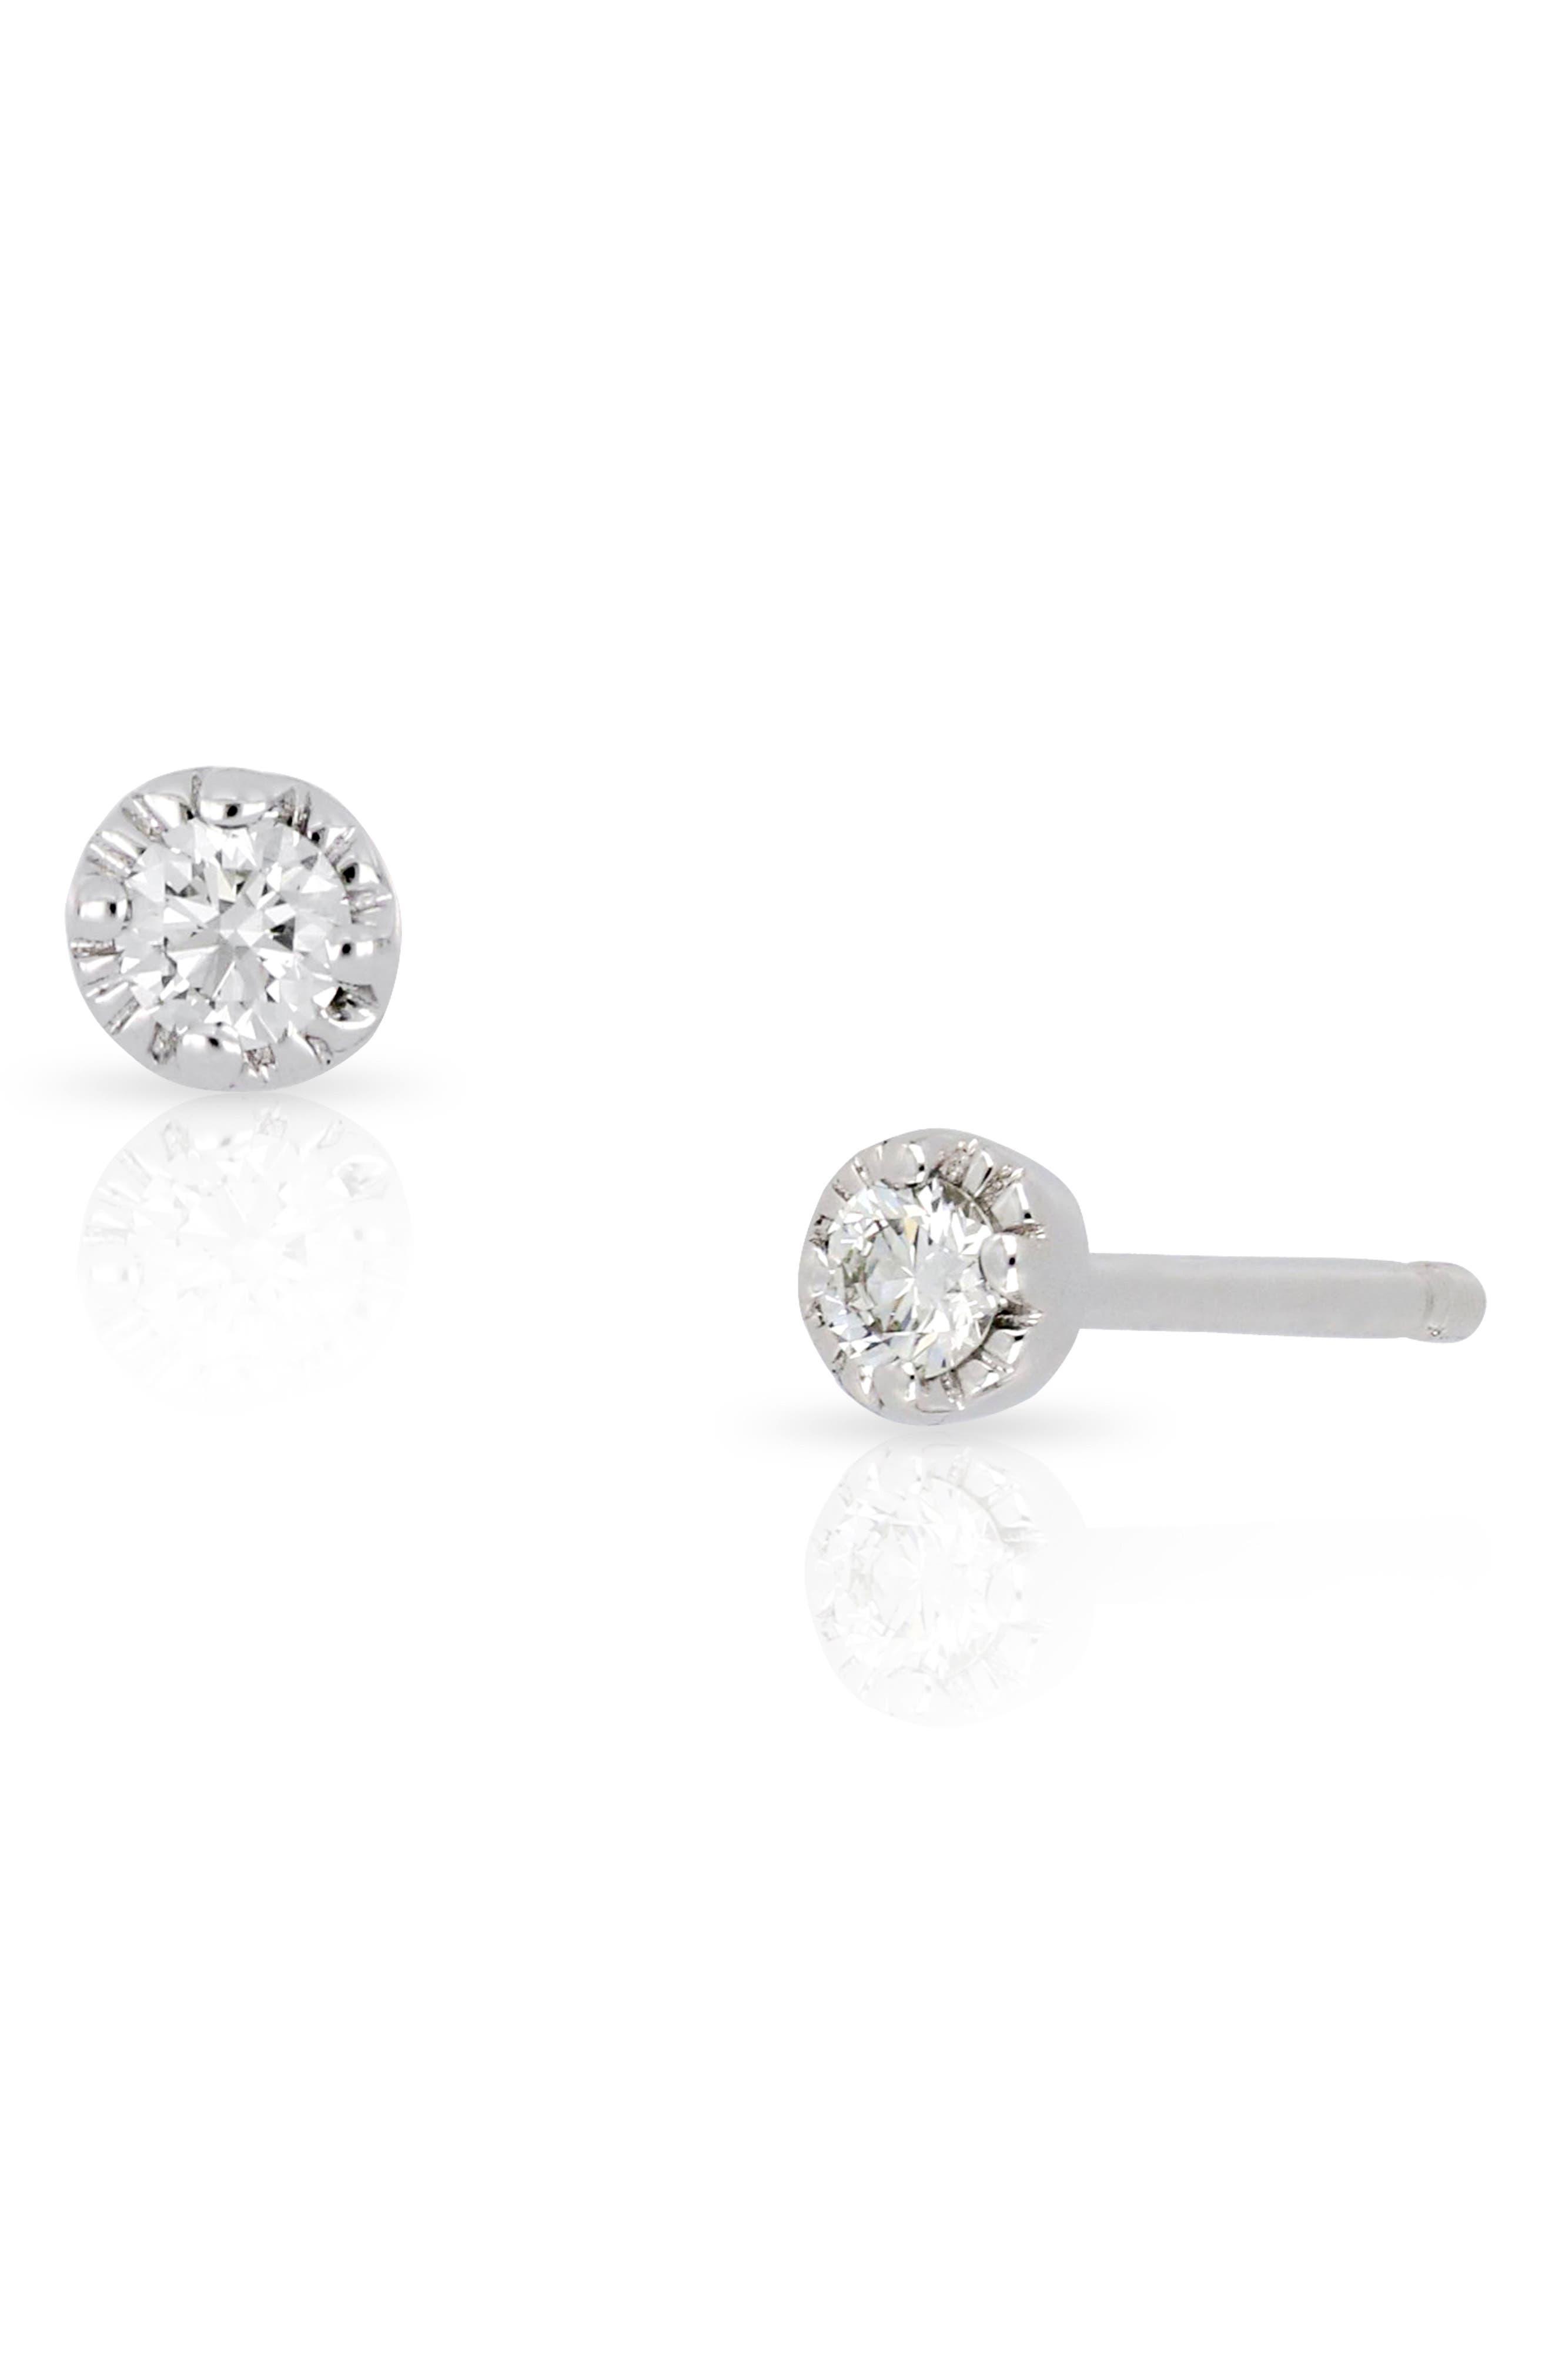 Mila Diamond Stud Earrings,                         Main,                         color, WHITE GOLD